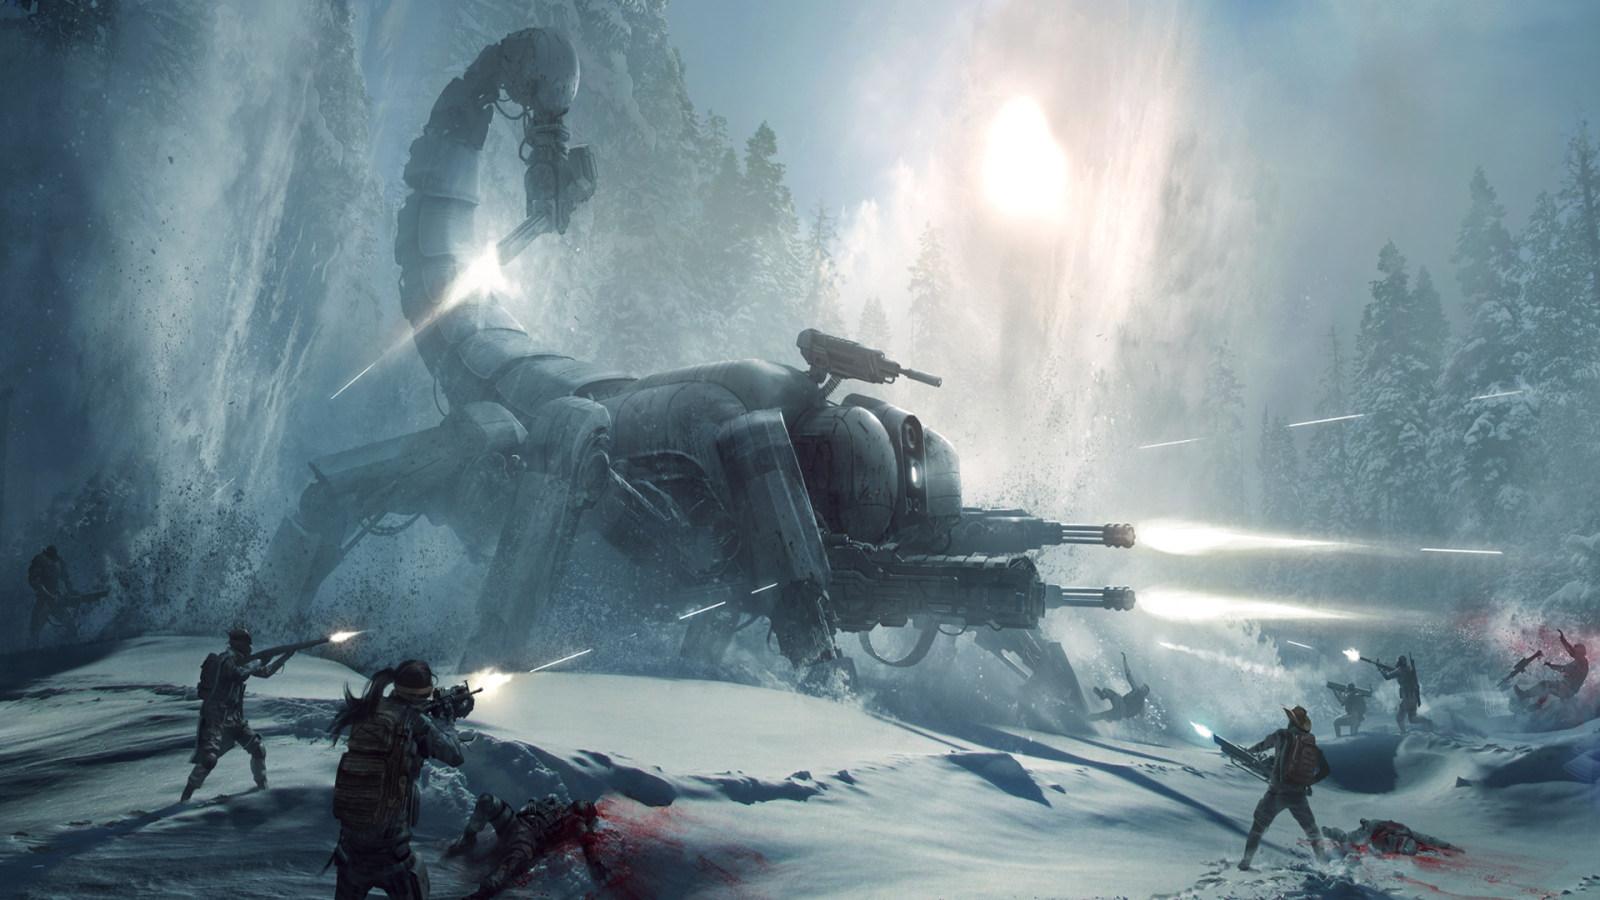 inXile发布招聘公告,或在制作全新第一人称射击类RPG游戏